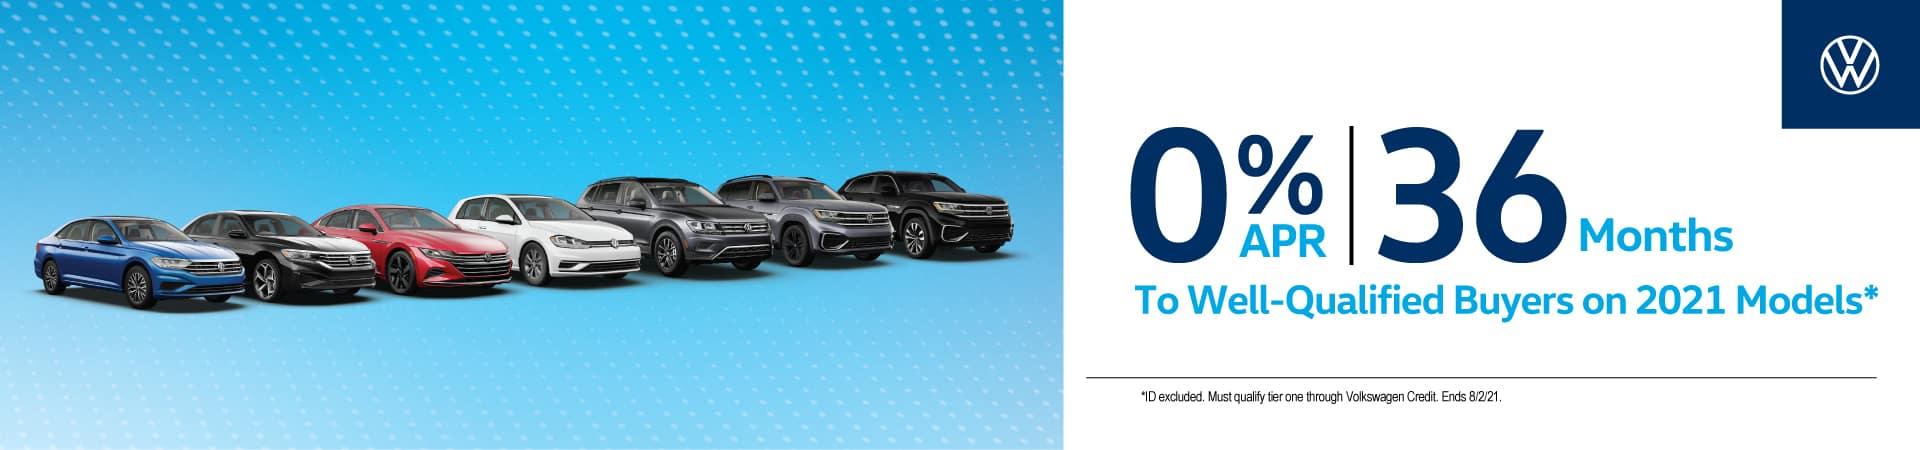 July-2021-VW-CS-Slides_0-APR-36-MO